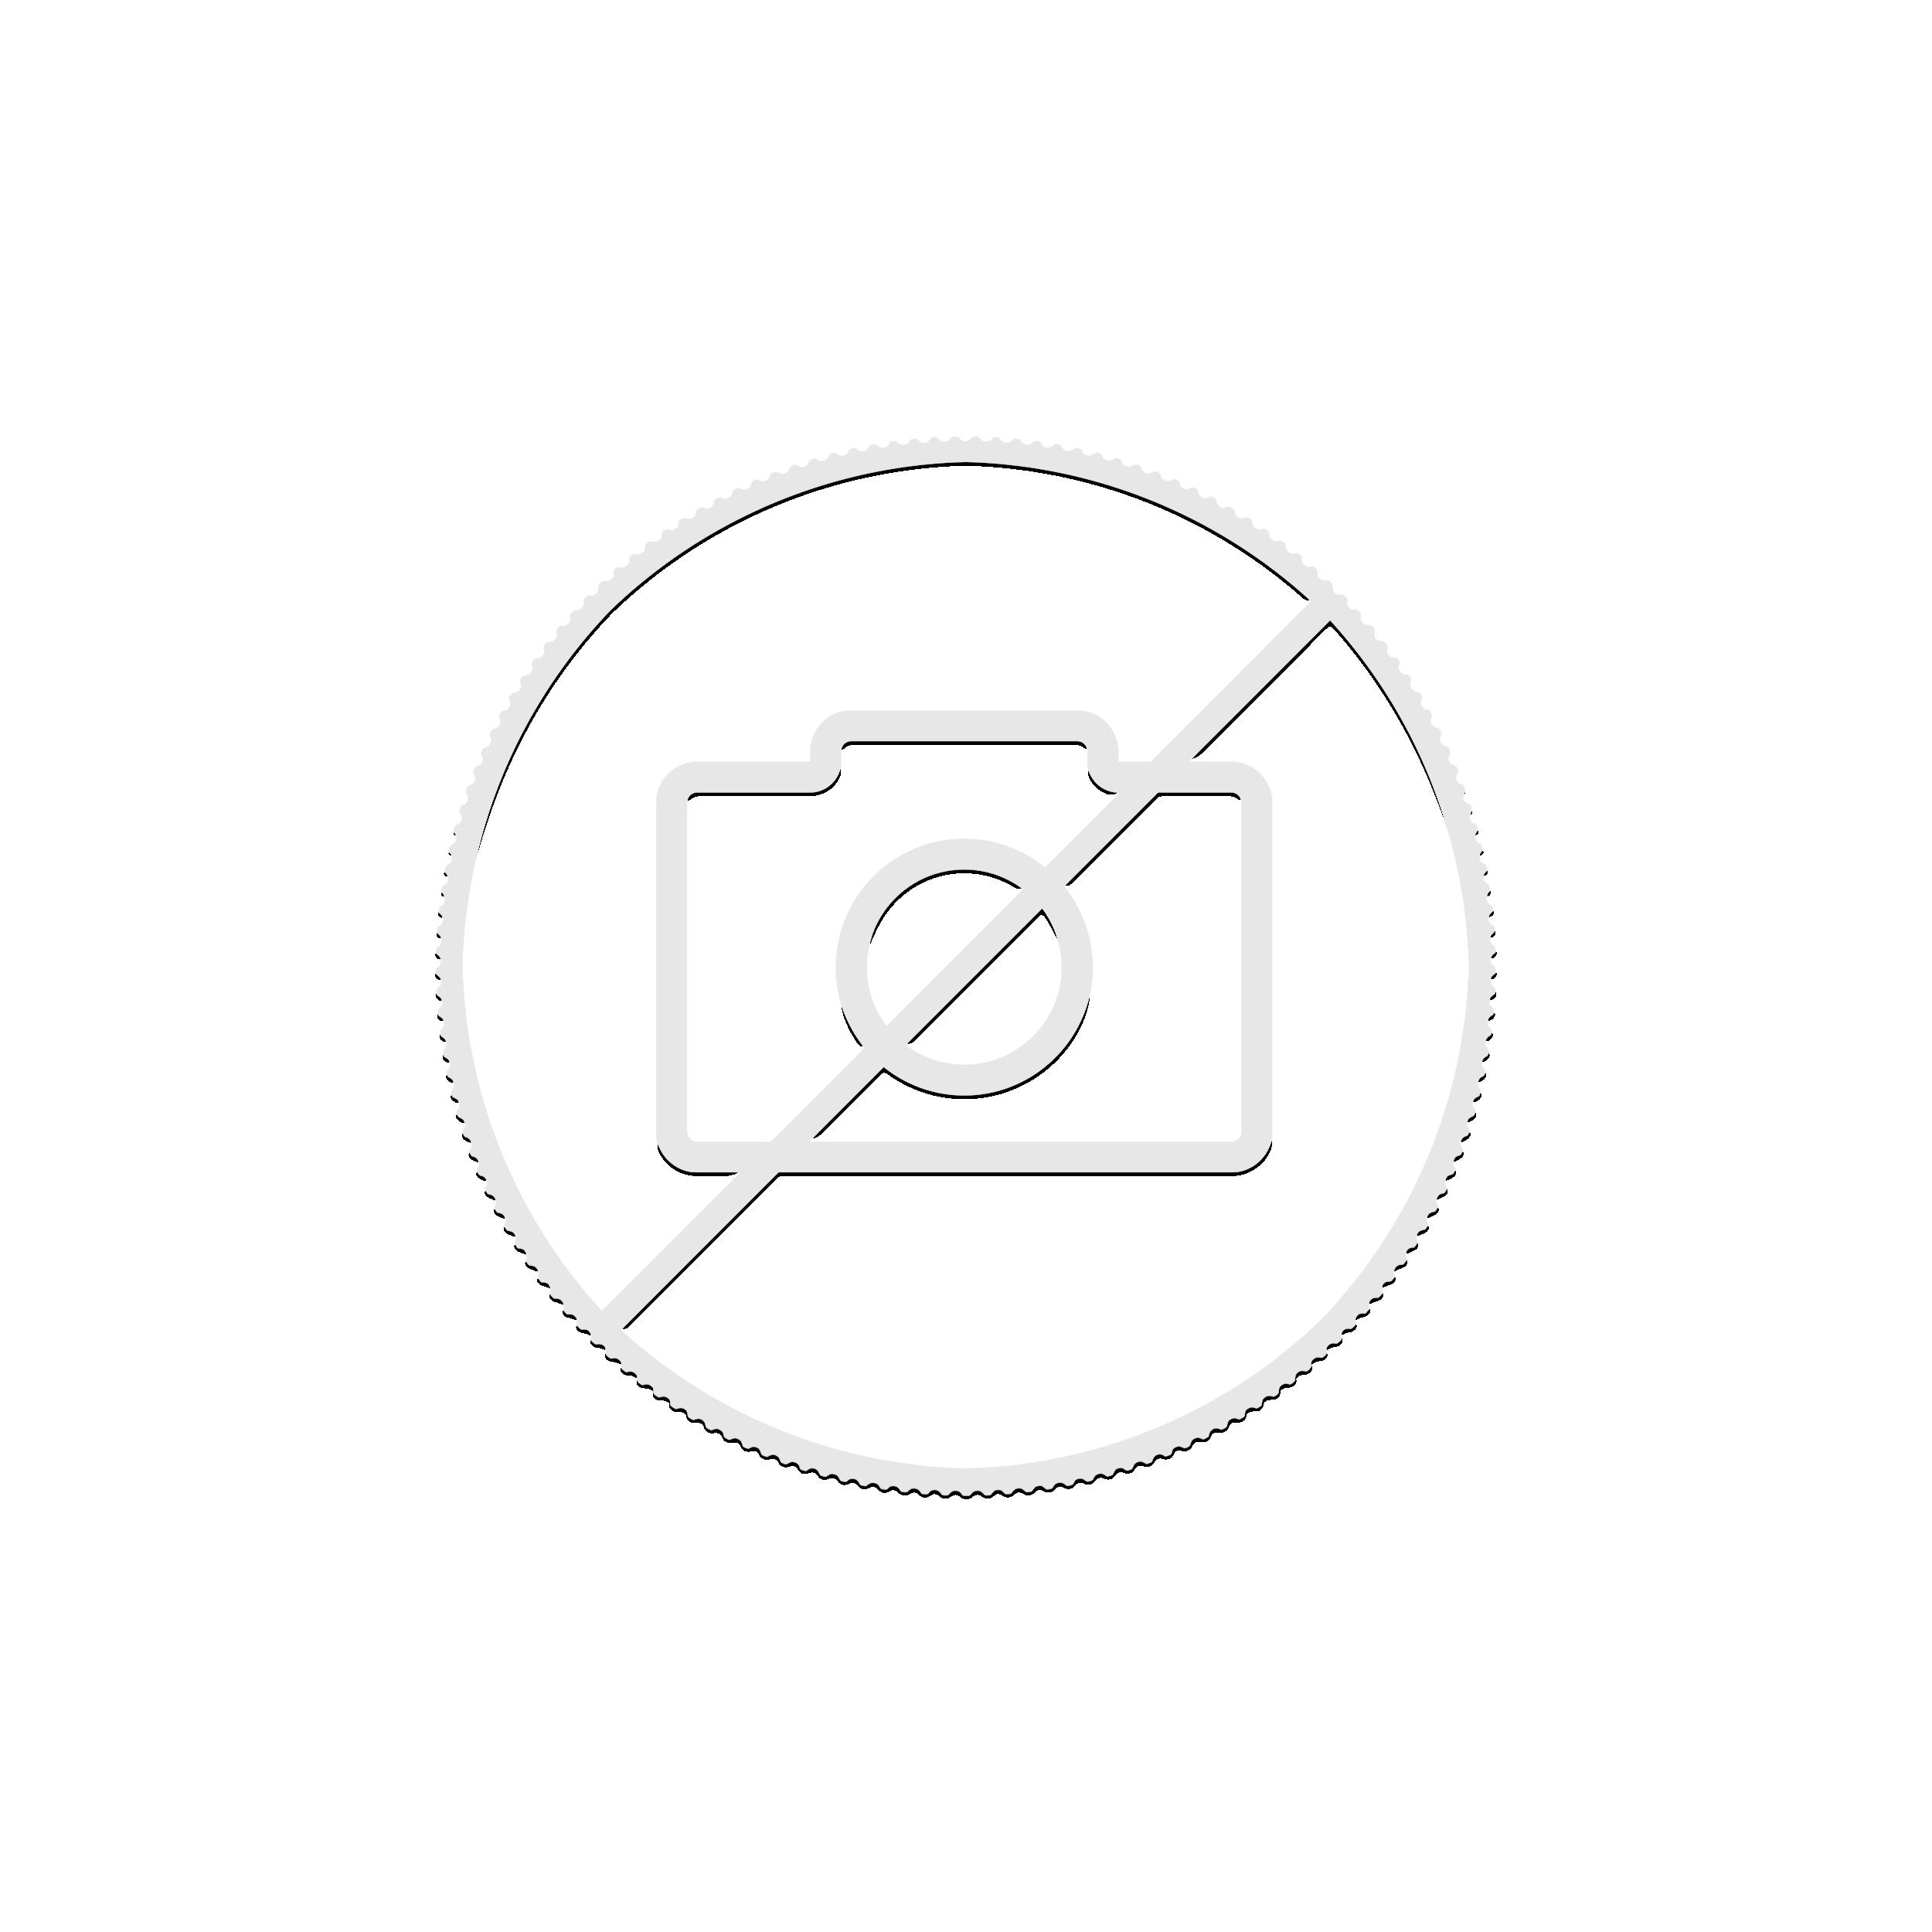 1/4 Troy ounce gold Krugerrand coin 2021